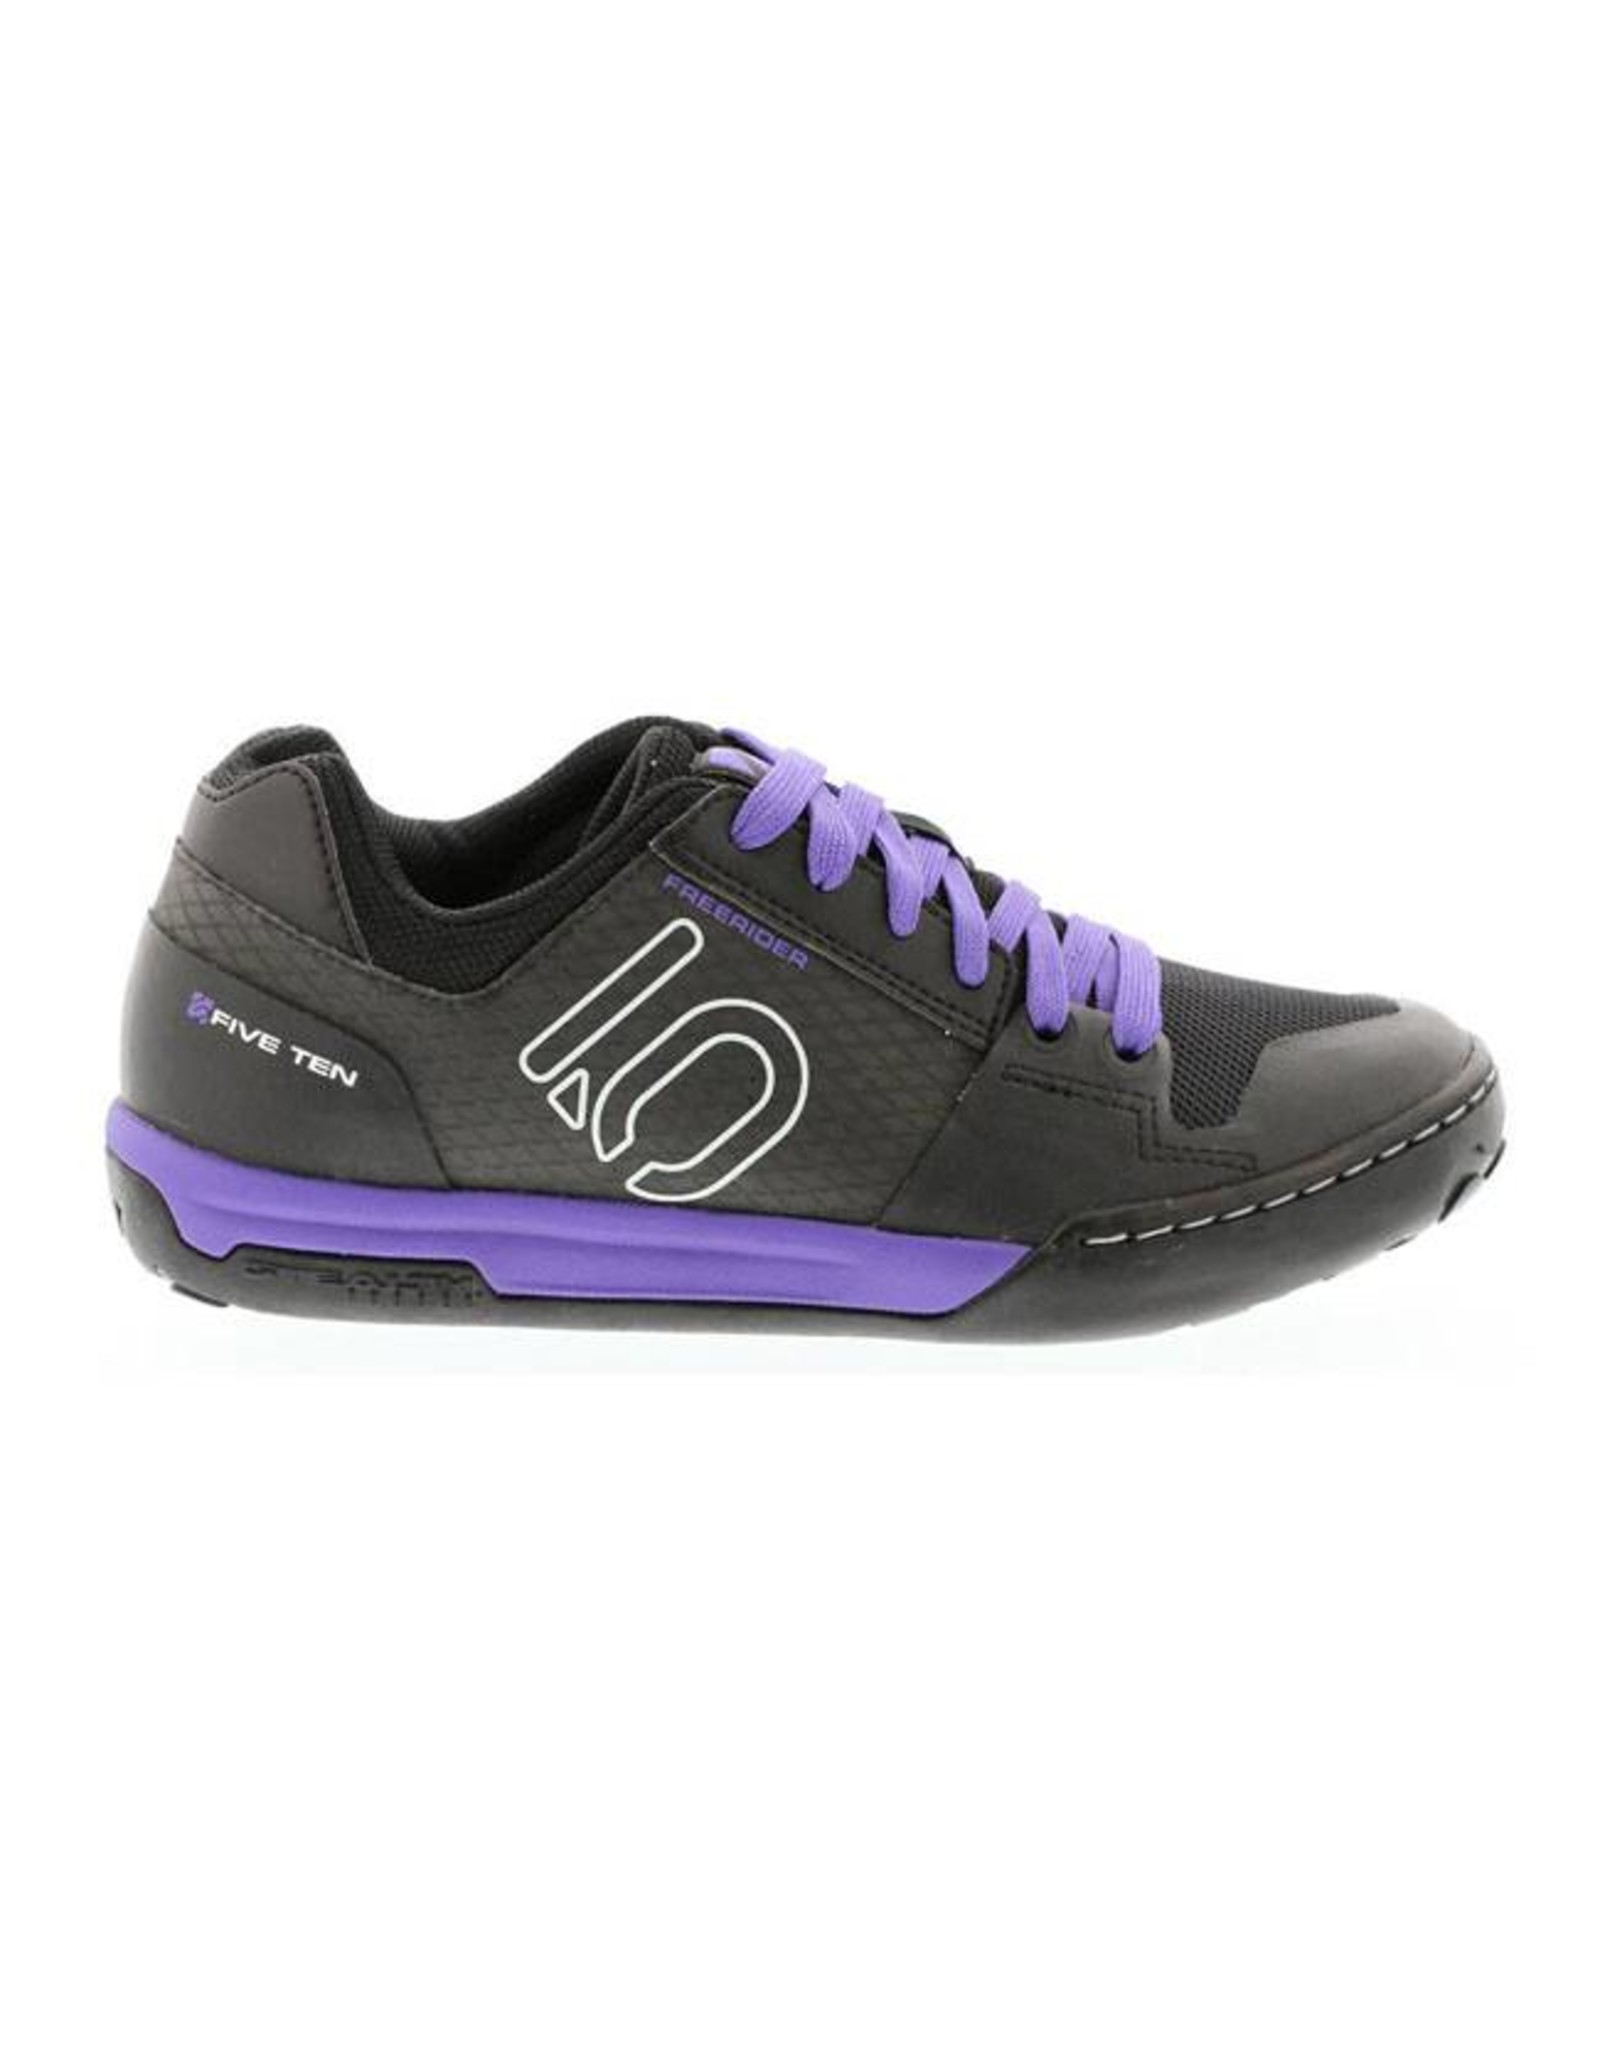 Five Ten Five Ten Freerider Contact Women's Flat Pedal Shoe: Split Purple 10